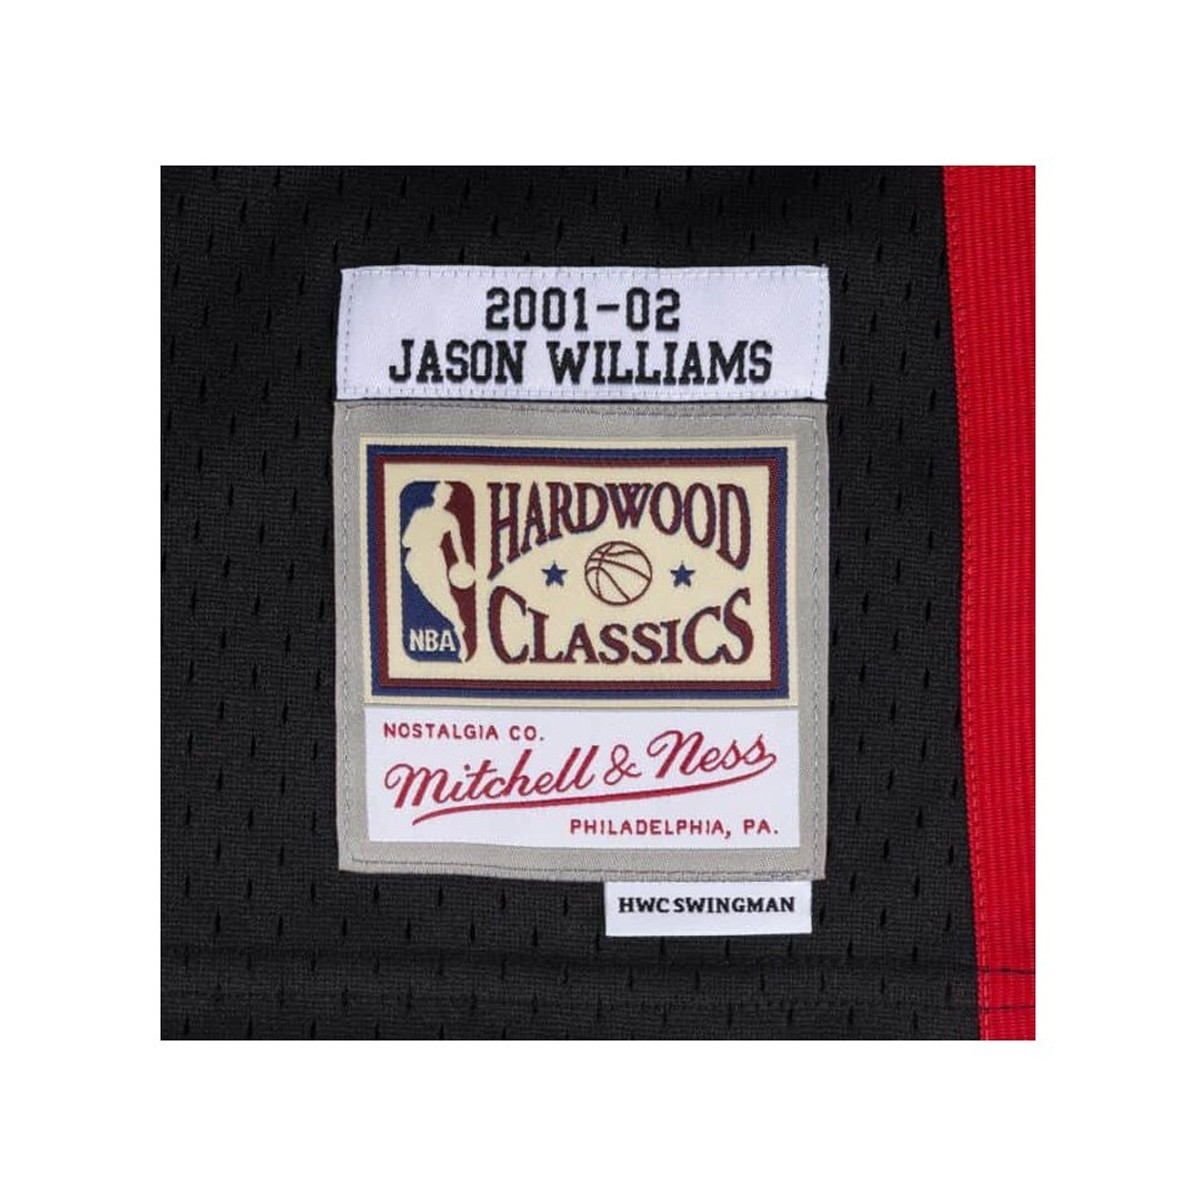 Mitchell & Ness Swingman Jersey Grizzlies Williams '2001-02'-SMJYCP19062